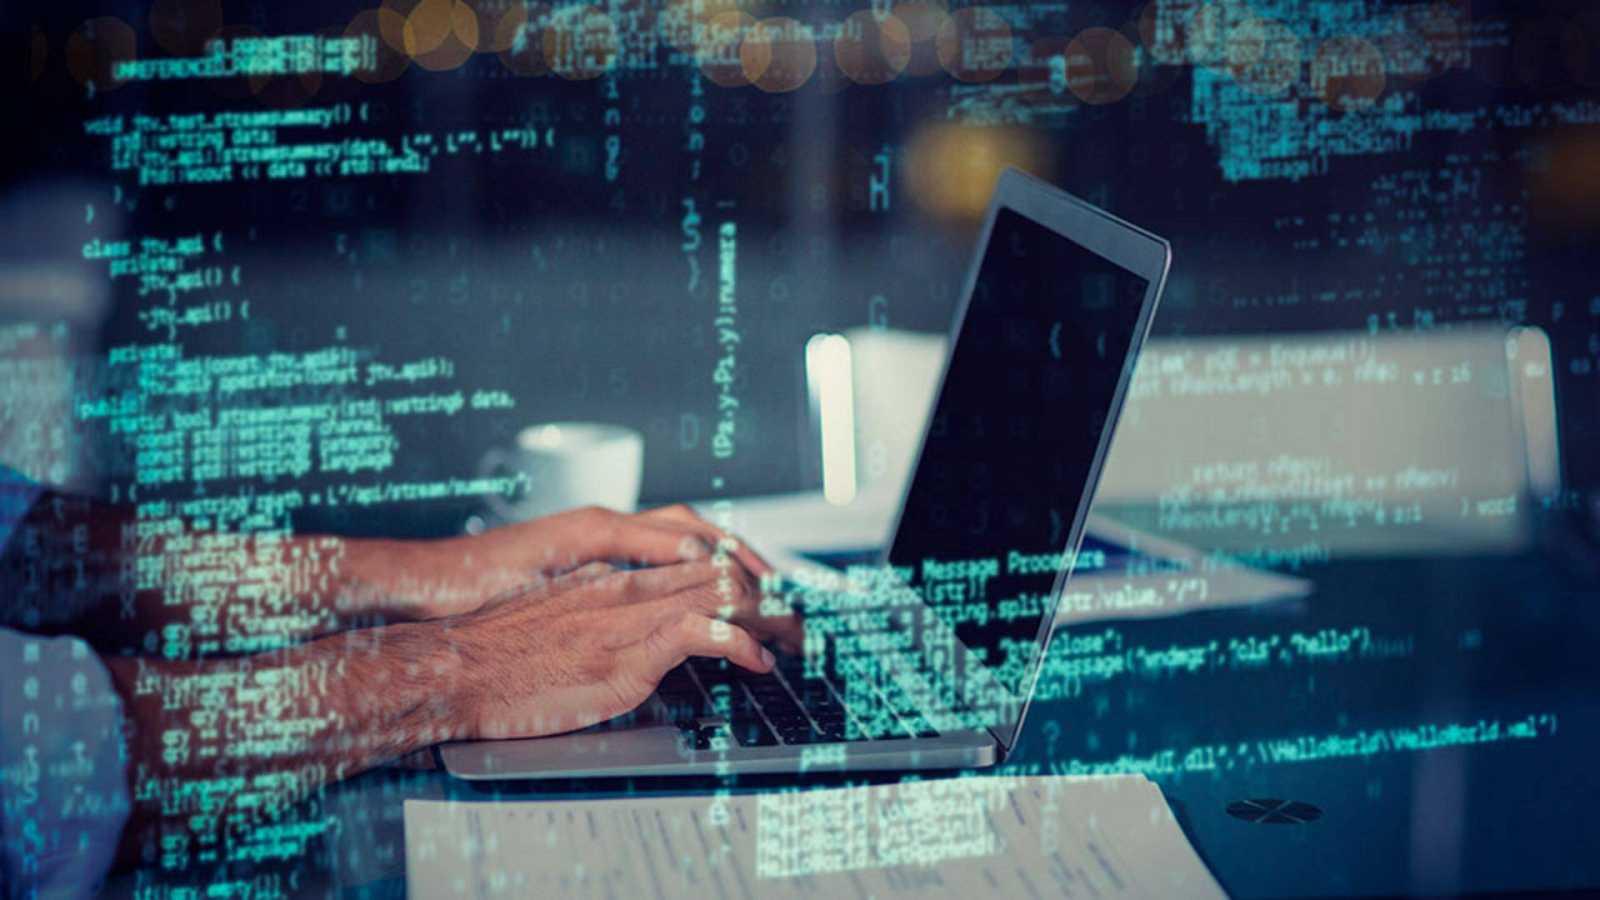 Alianza 2030 - Ciberseguridad frente a ciberdelincuencia - 04/10/20 - Escuchar ahora